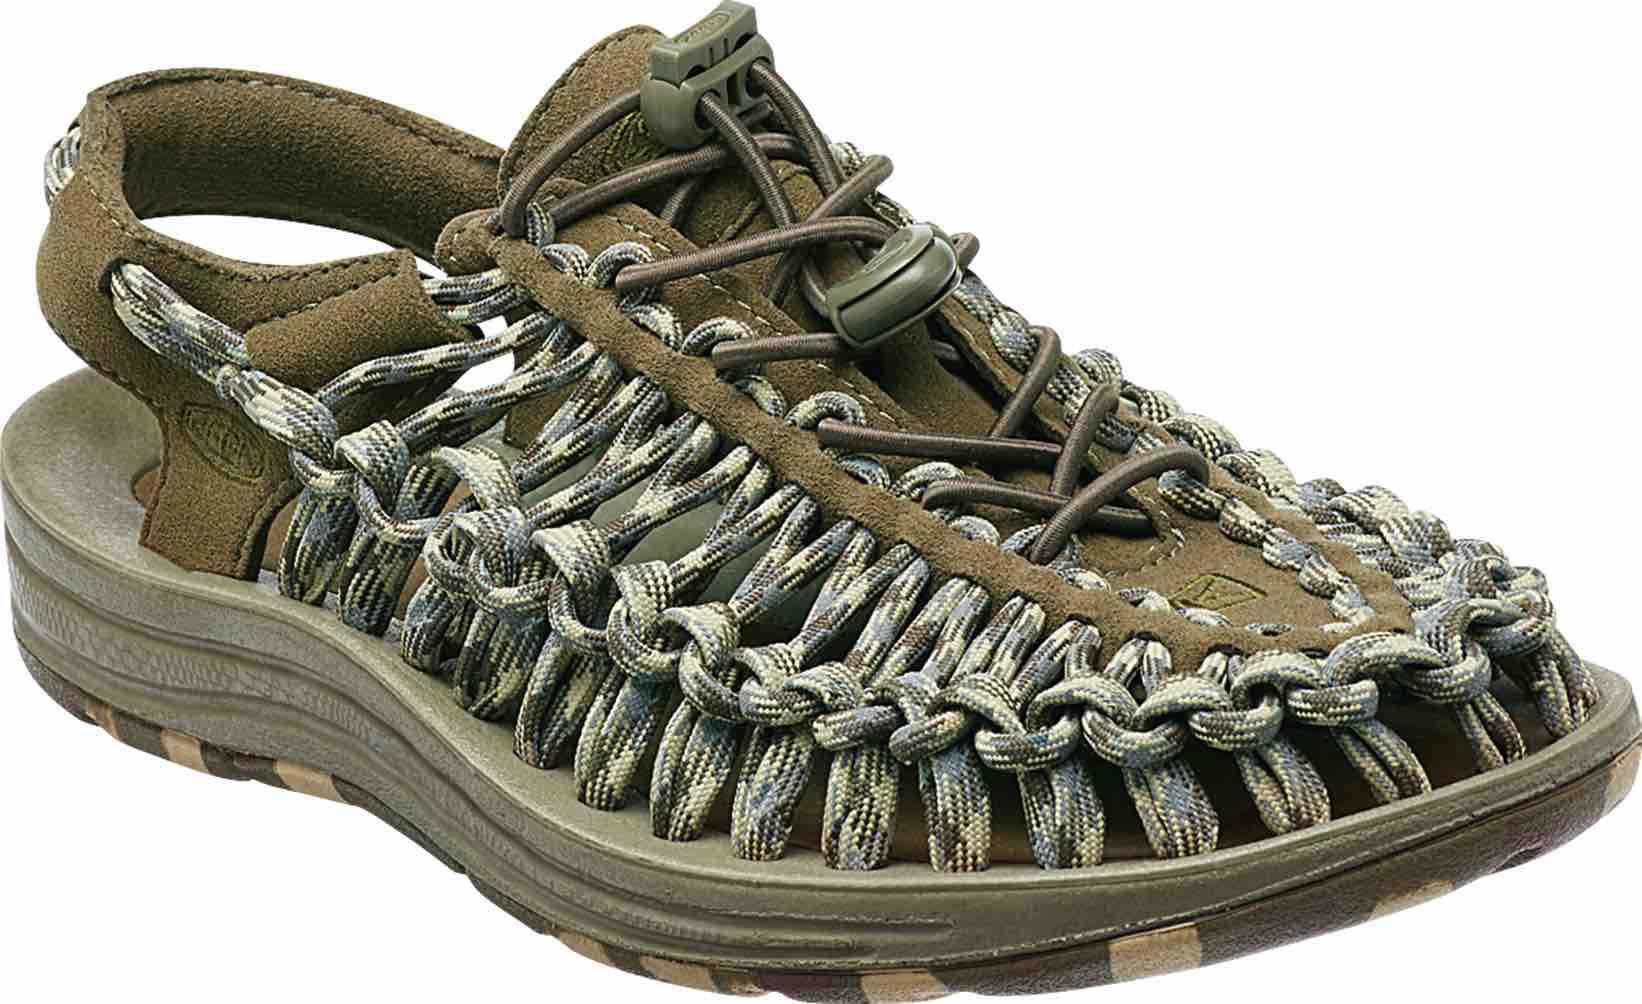 oshman's x keen uneek - sneakers magazine